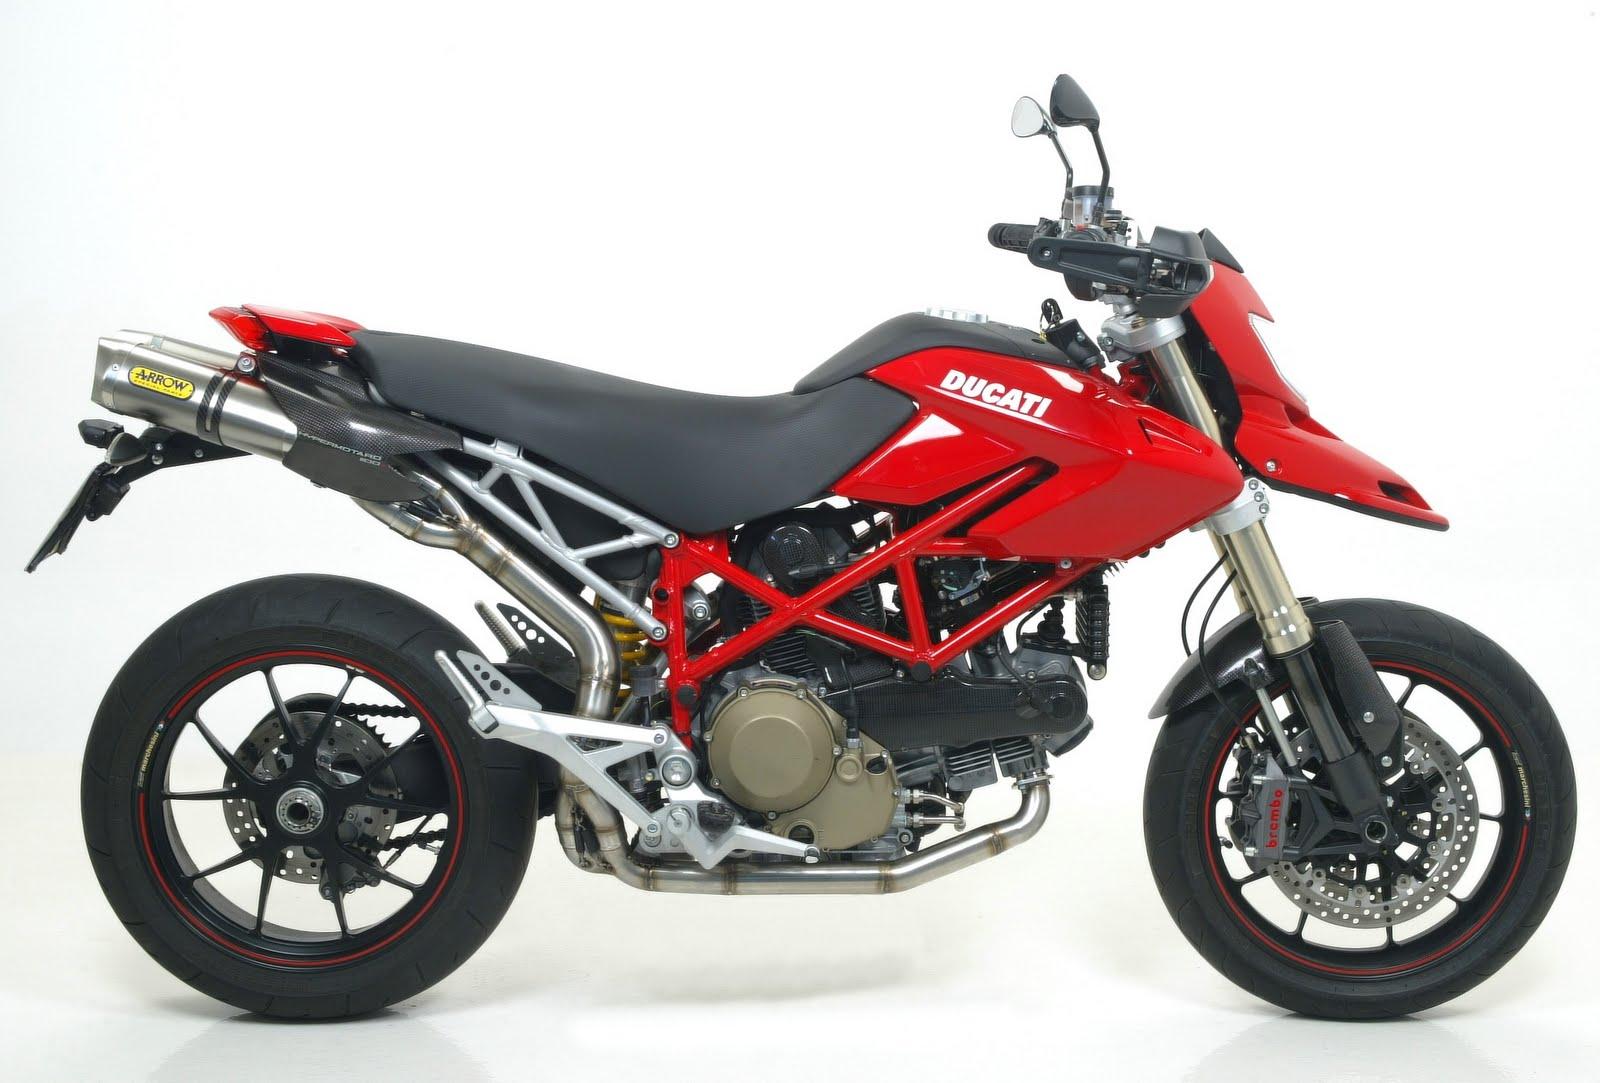 Beautiful Bikes Ducati Hypermotard